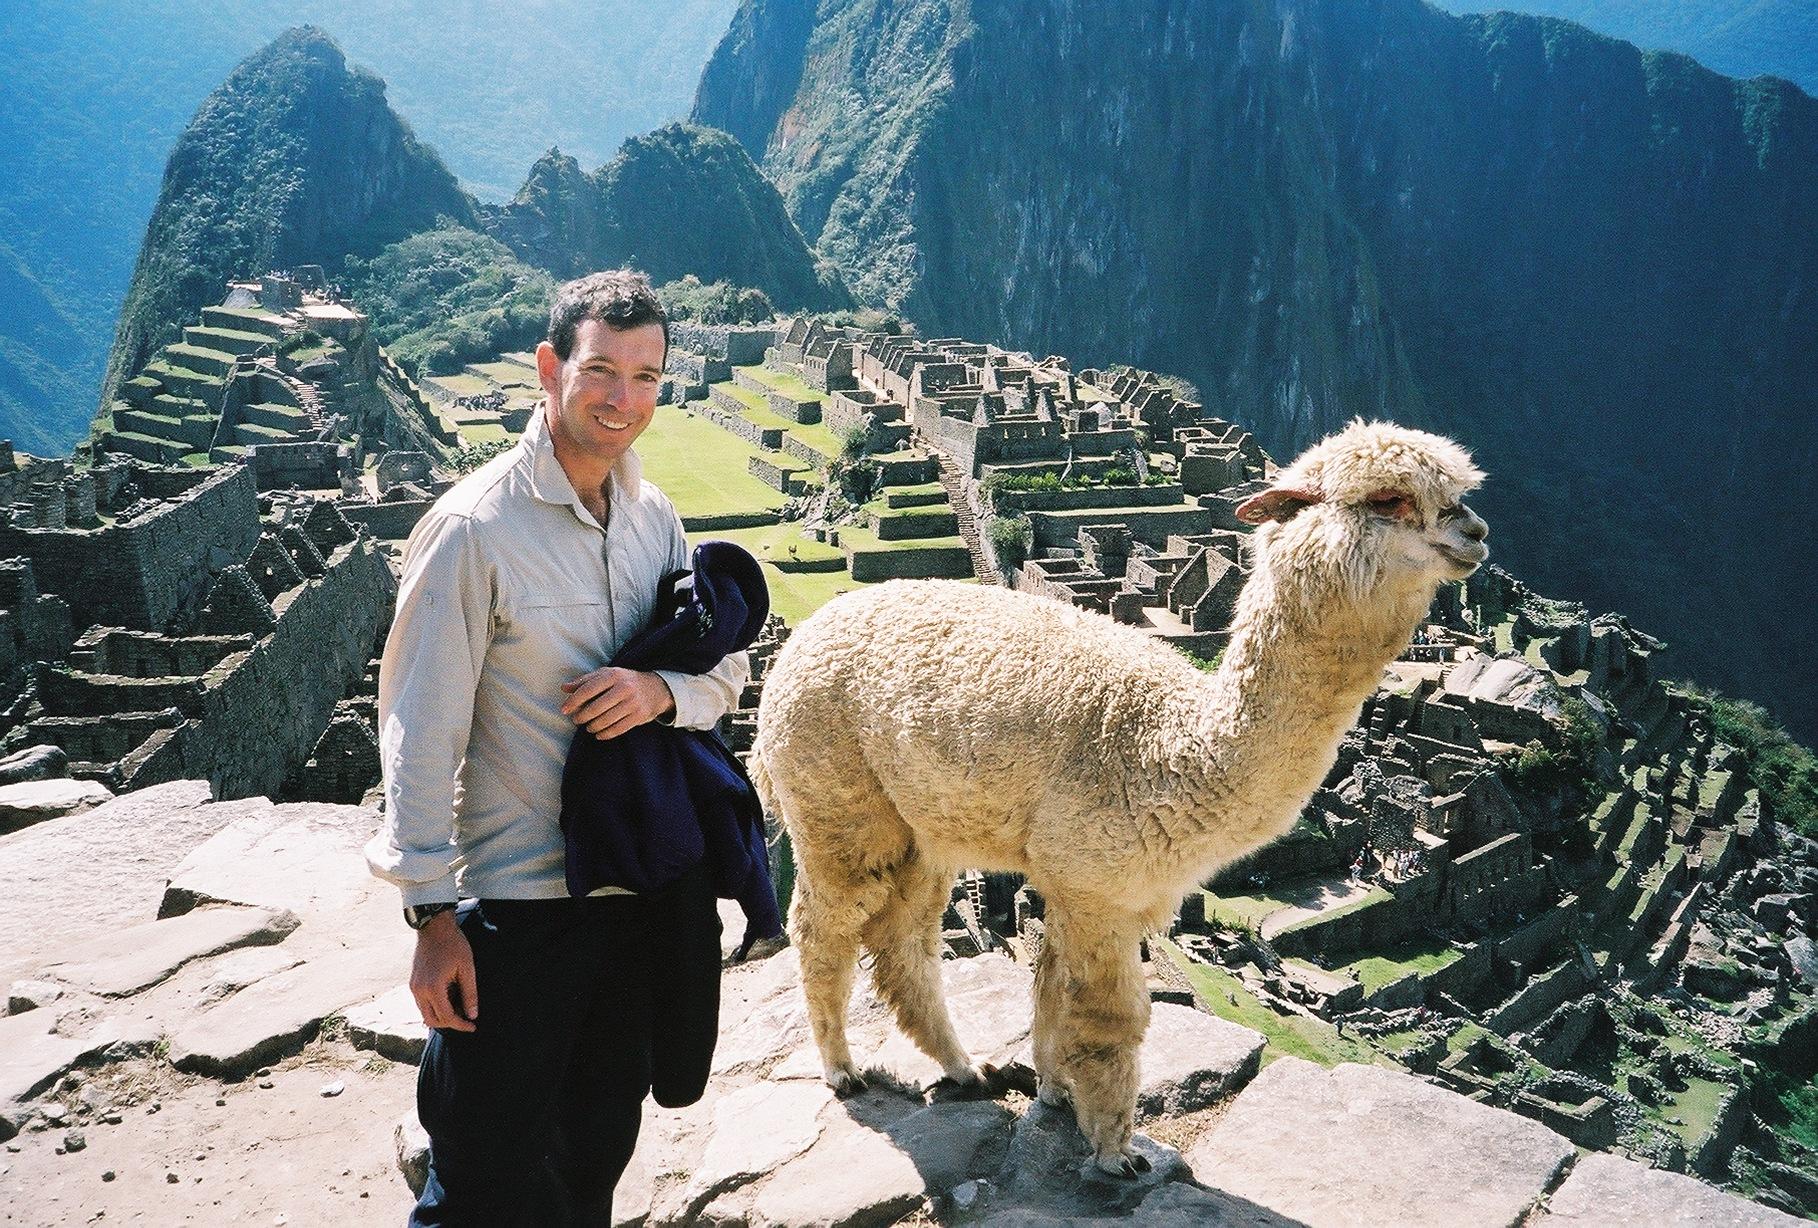 Machu Piccu by Nathaniel Smelser